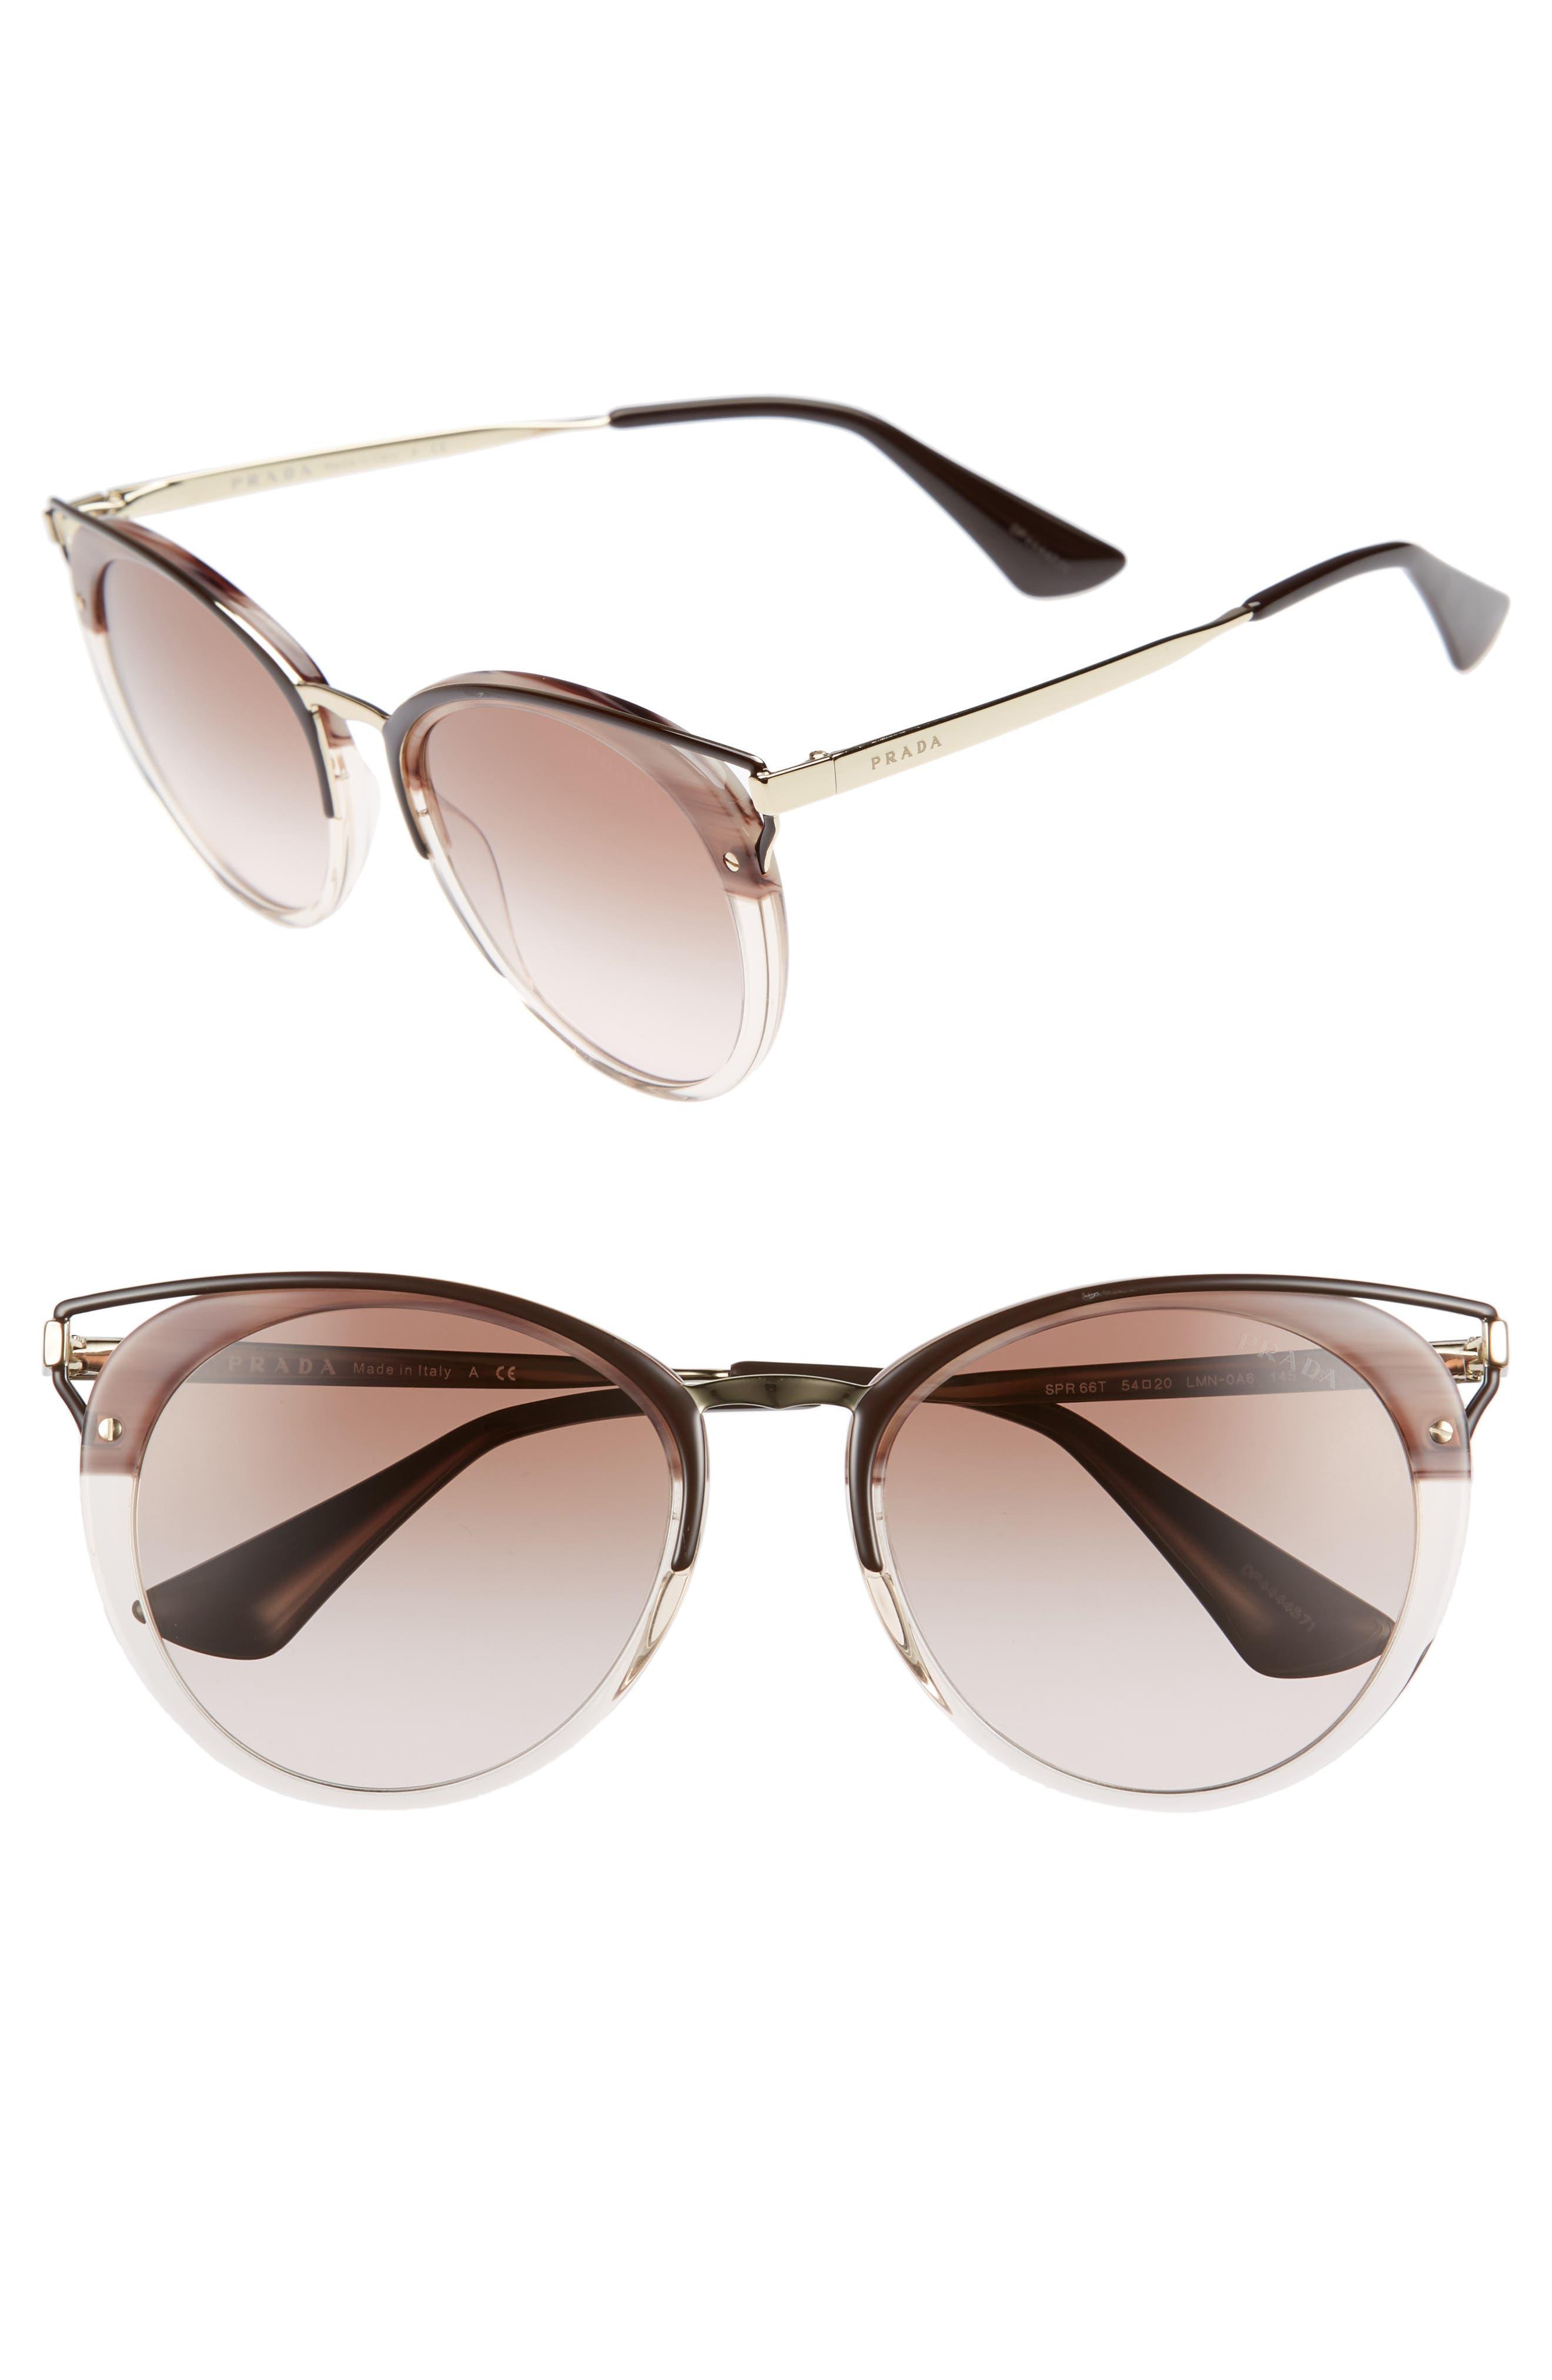 35c159b3cd3 netherlands prada pr 27ns minimal baroque prescription sunglasses 1c9f3  9ffe2  greece prada sunglasses for women nordstrom 2d7bc 0018a